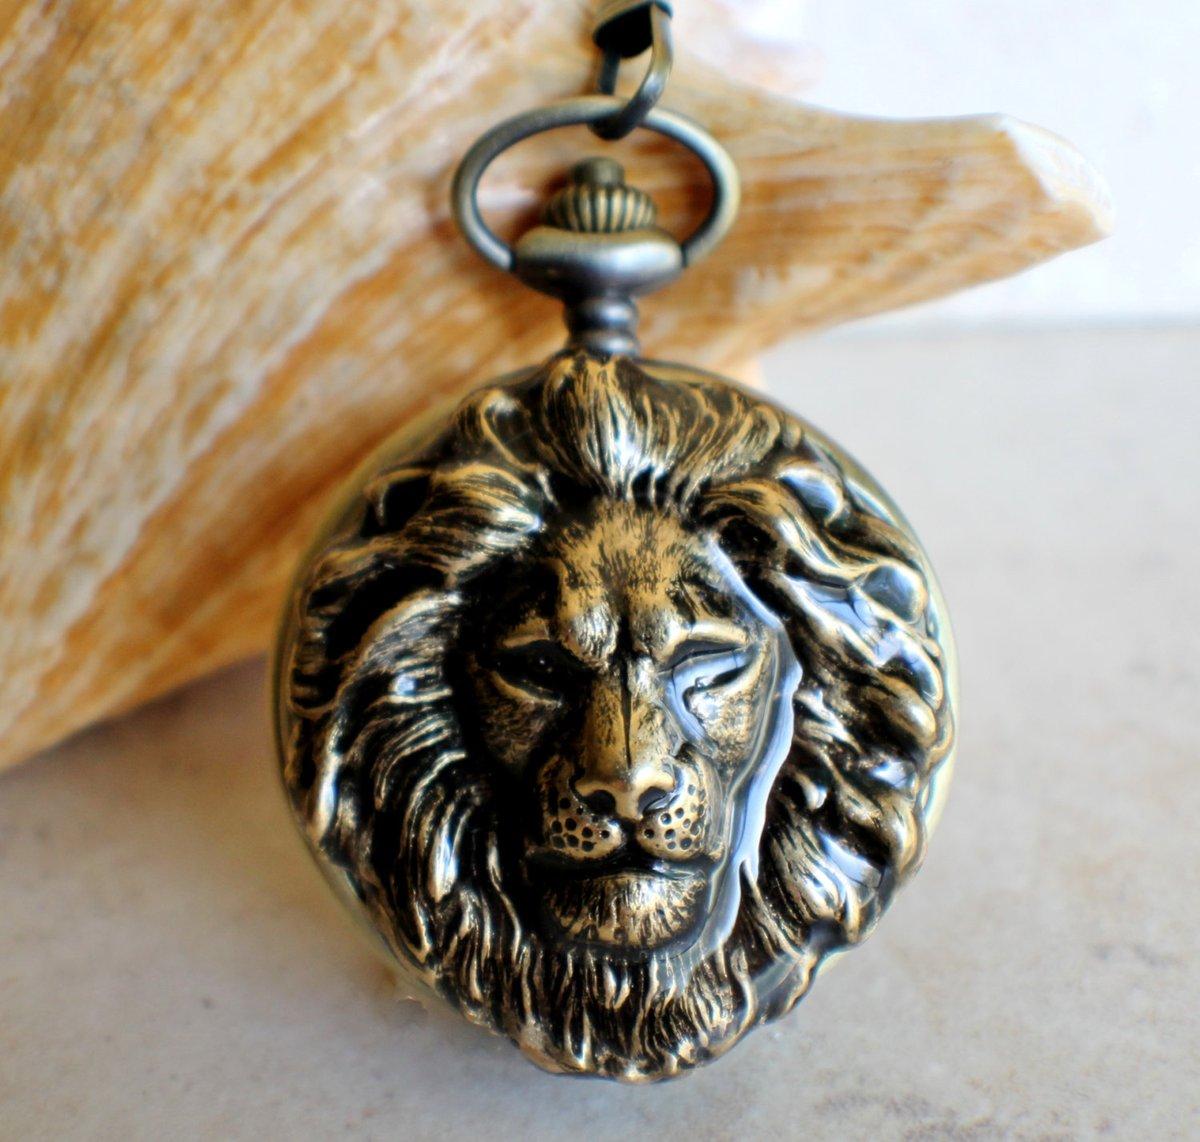 Lion pocket watch, Bronze lion pocket watch,  with tiger eye beads on watch chain https://t.co/Rr30HskL7c #Charsfavoritethings #Etsy #Handmadejewelry ##pottiteam #PottiTeam https://t.co/JdzovlQ1NP